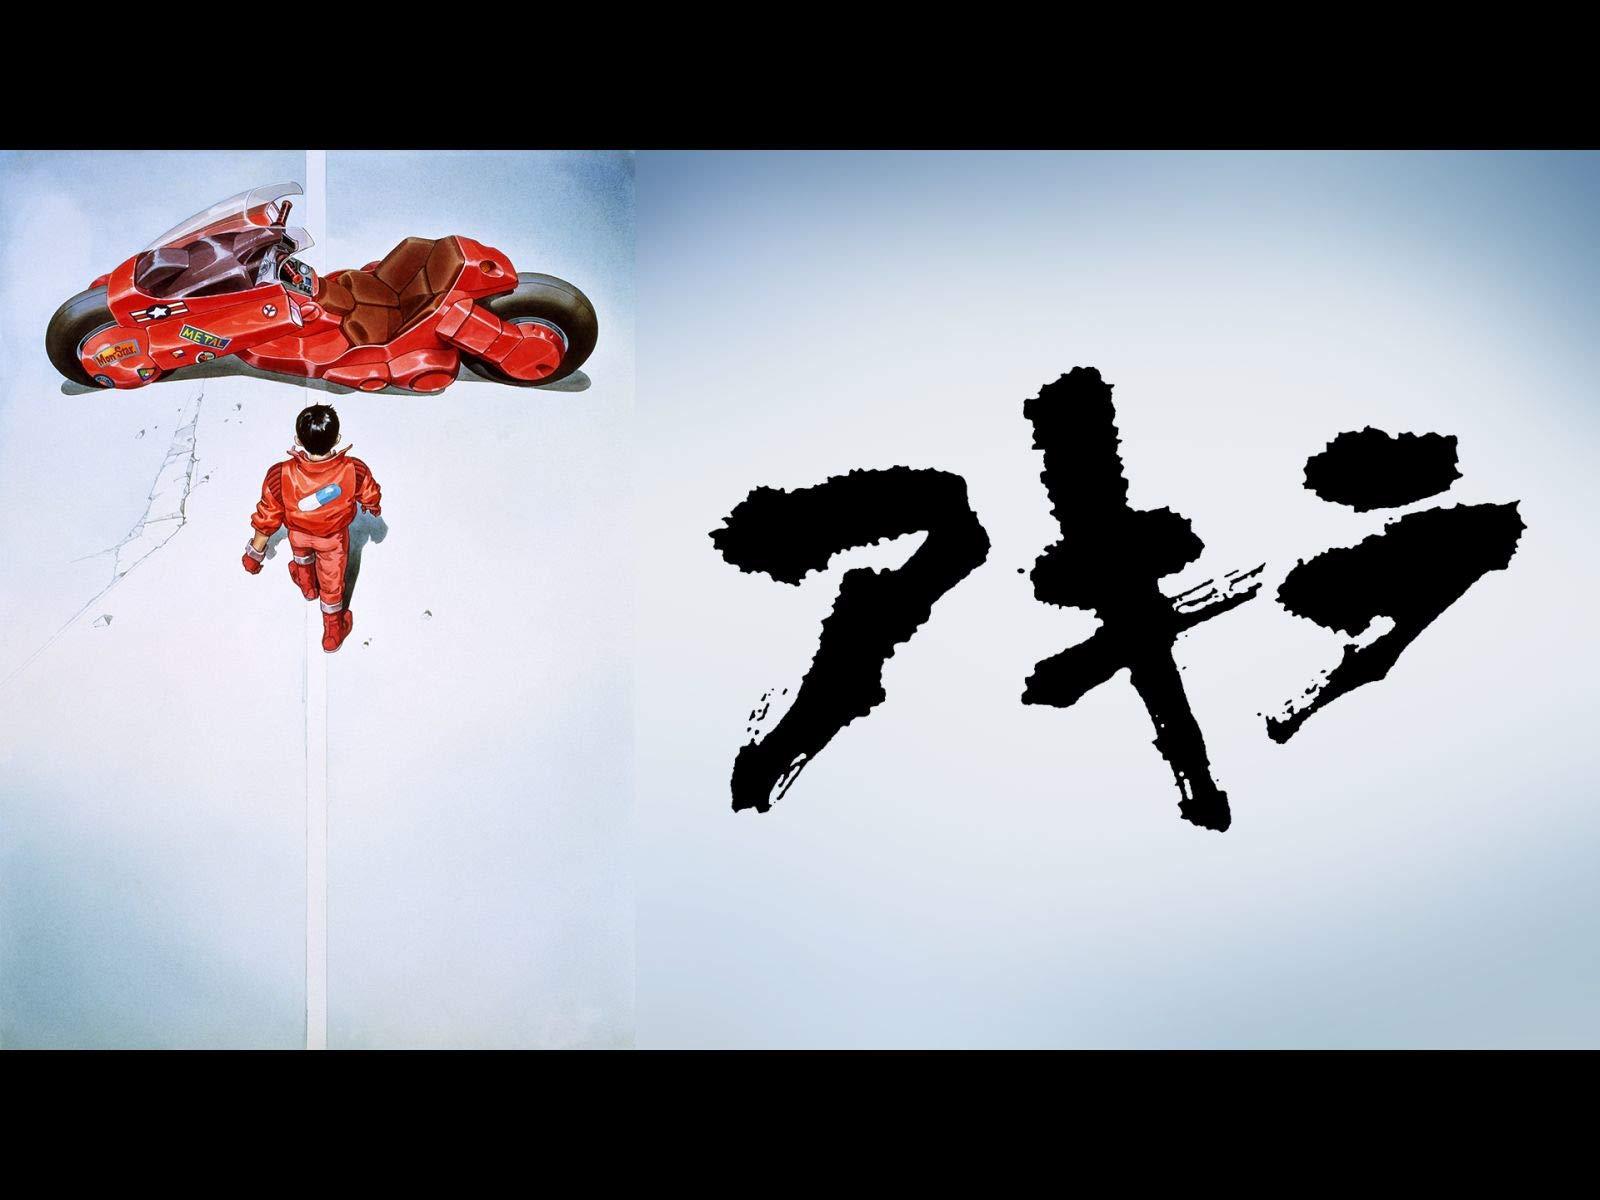 Amazon Co Jp akira Dアニメストア を観る Prime Video